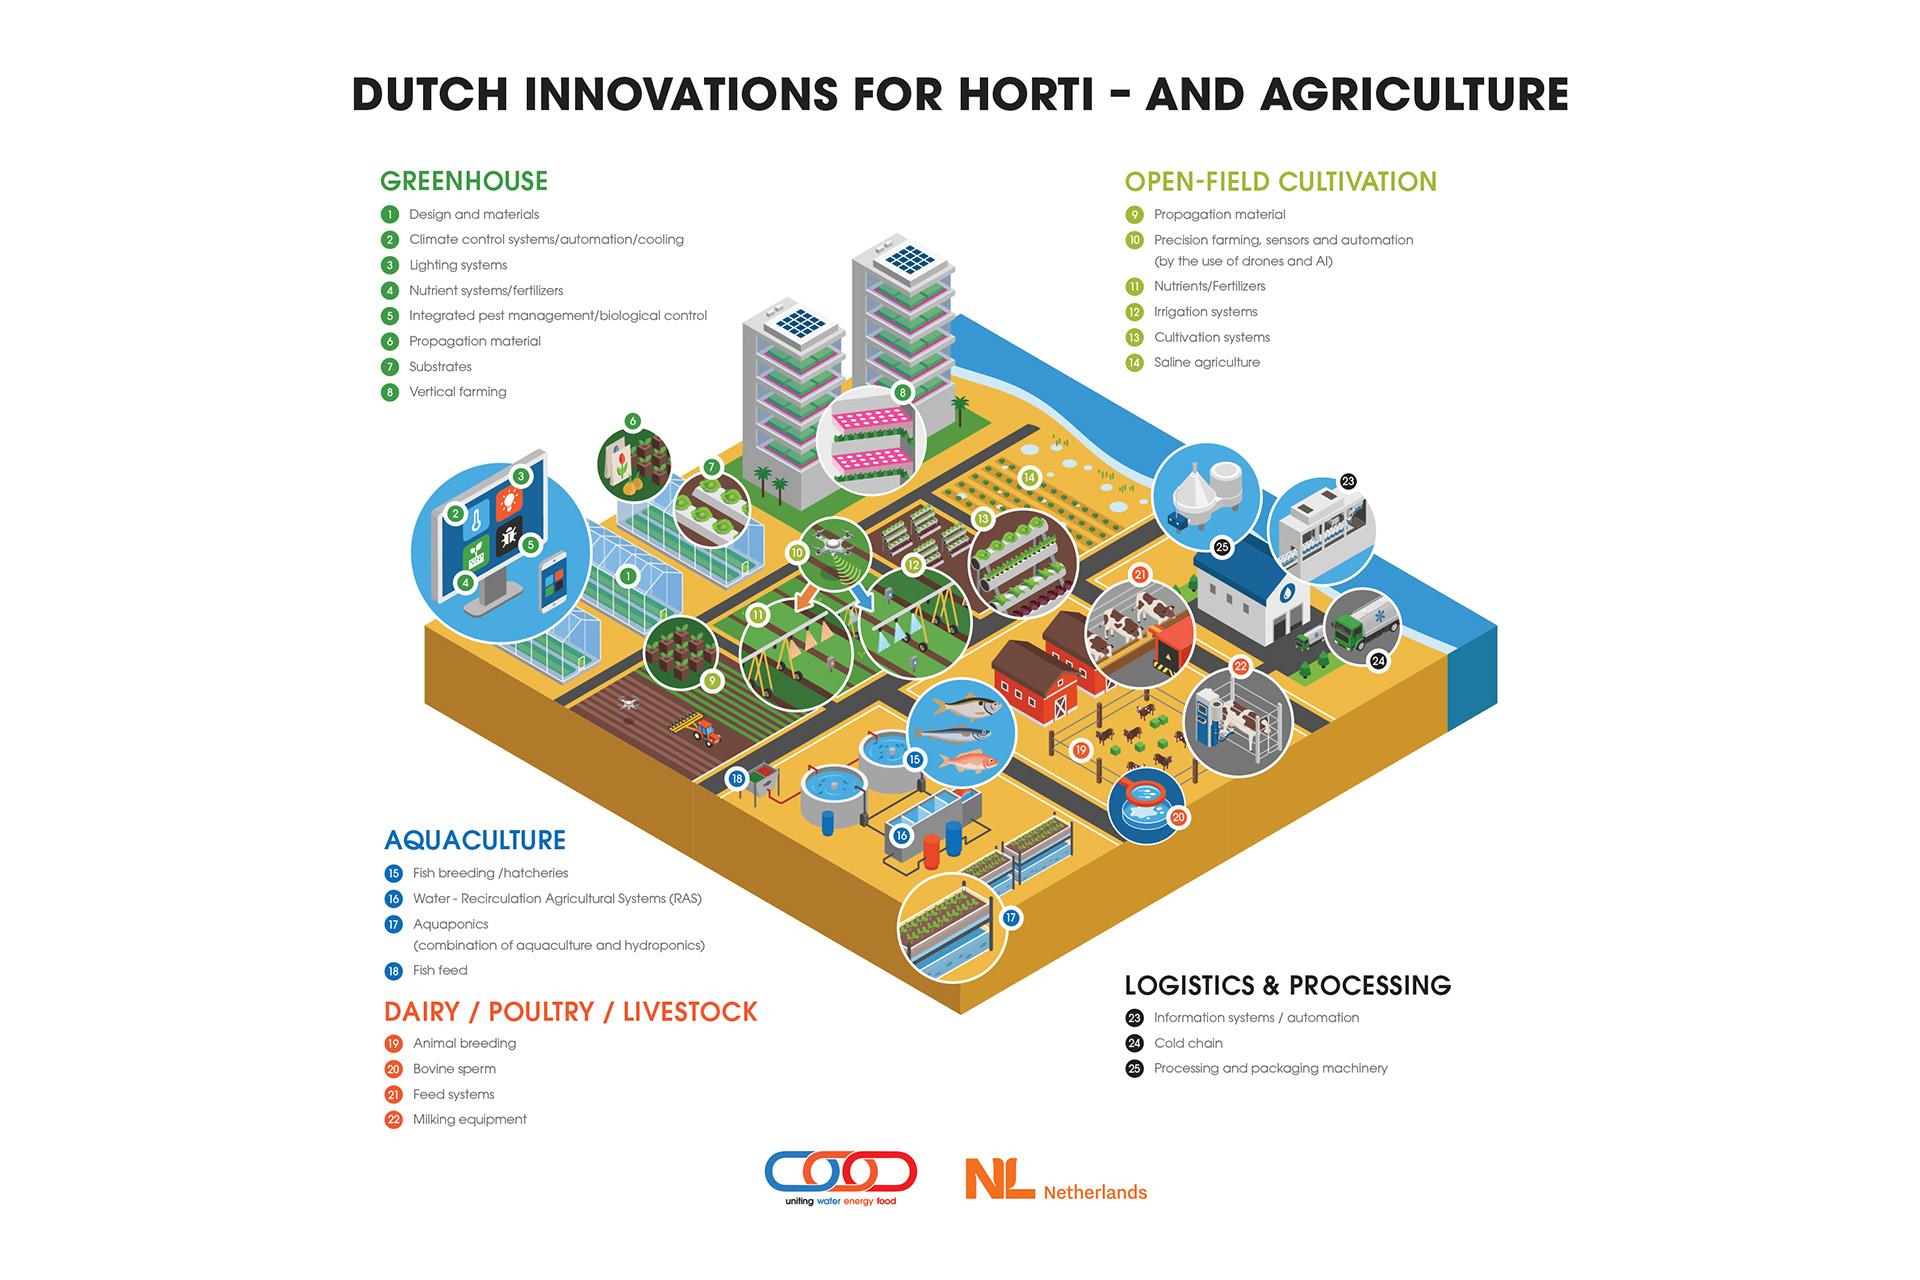 DutchGulf - Separate Agriculture